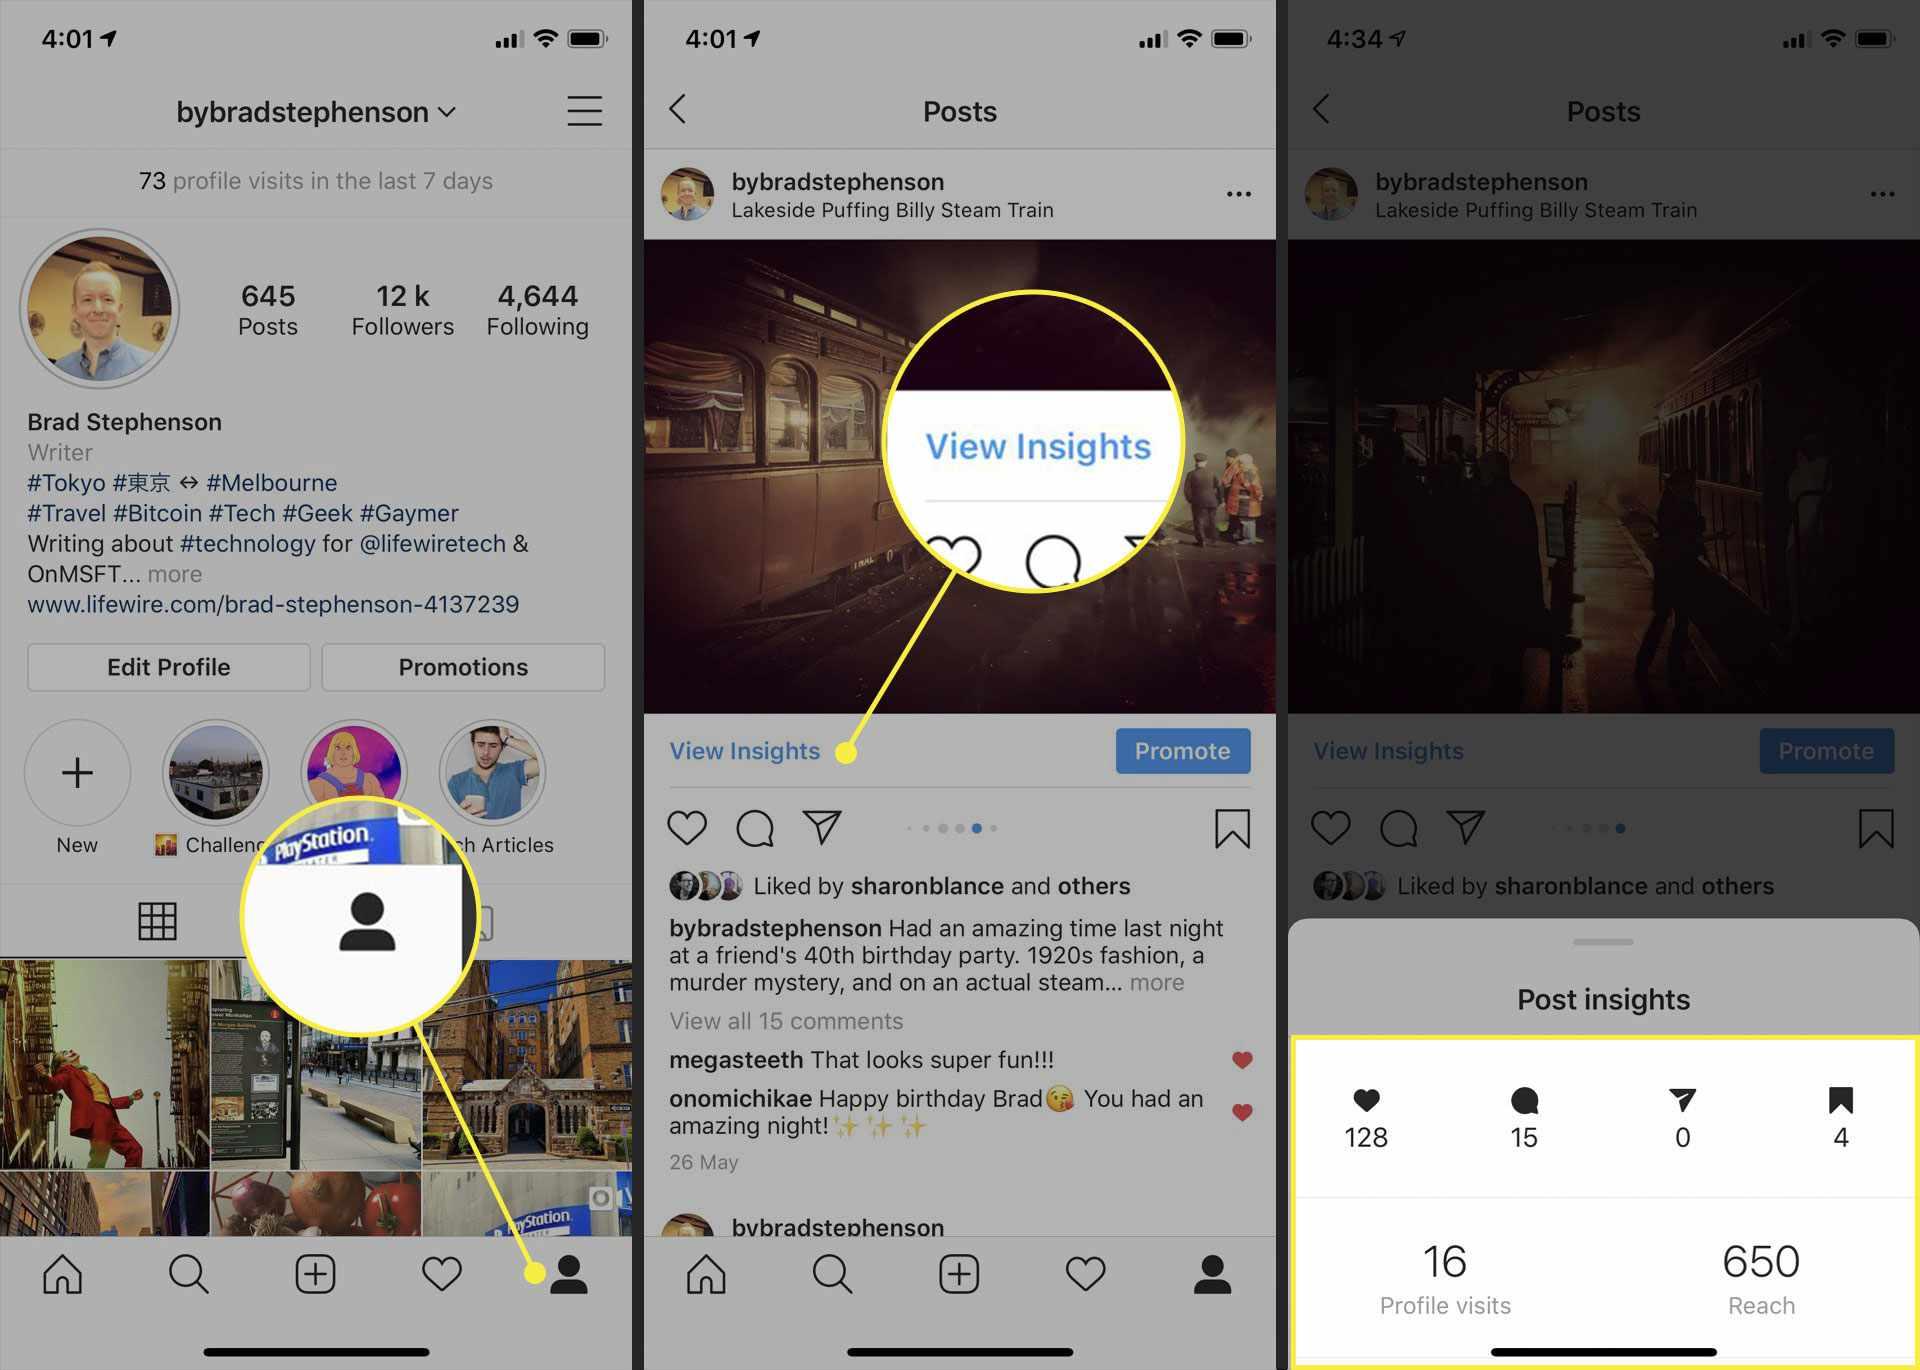 Post insights on Instagram